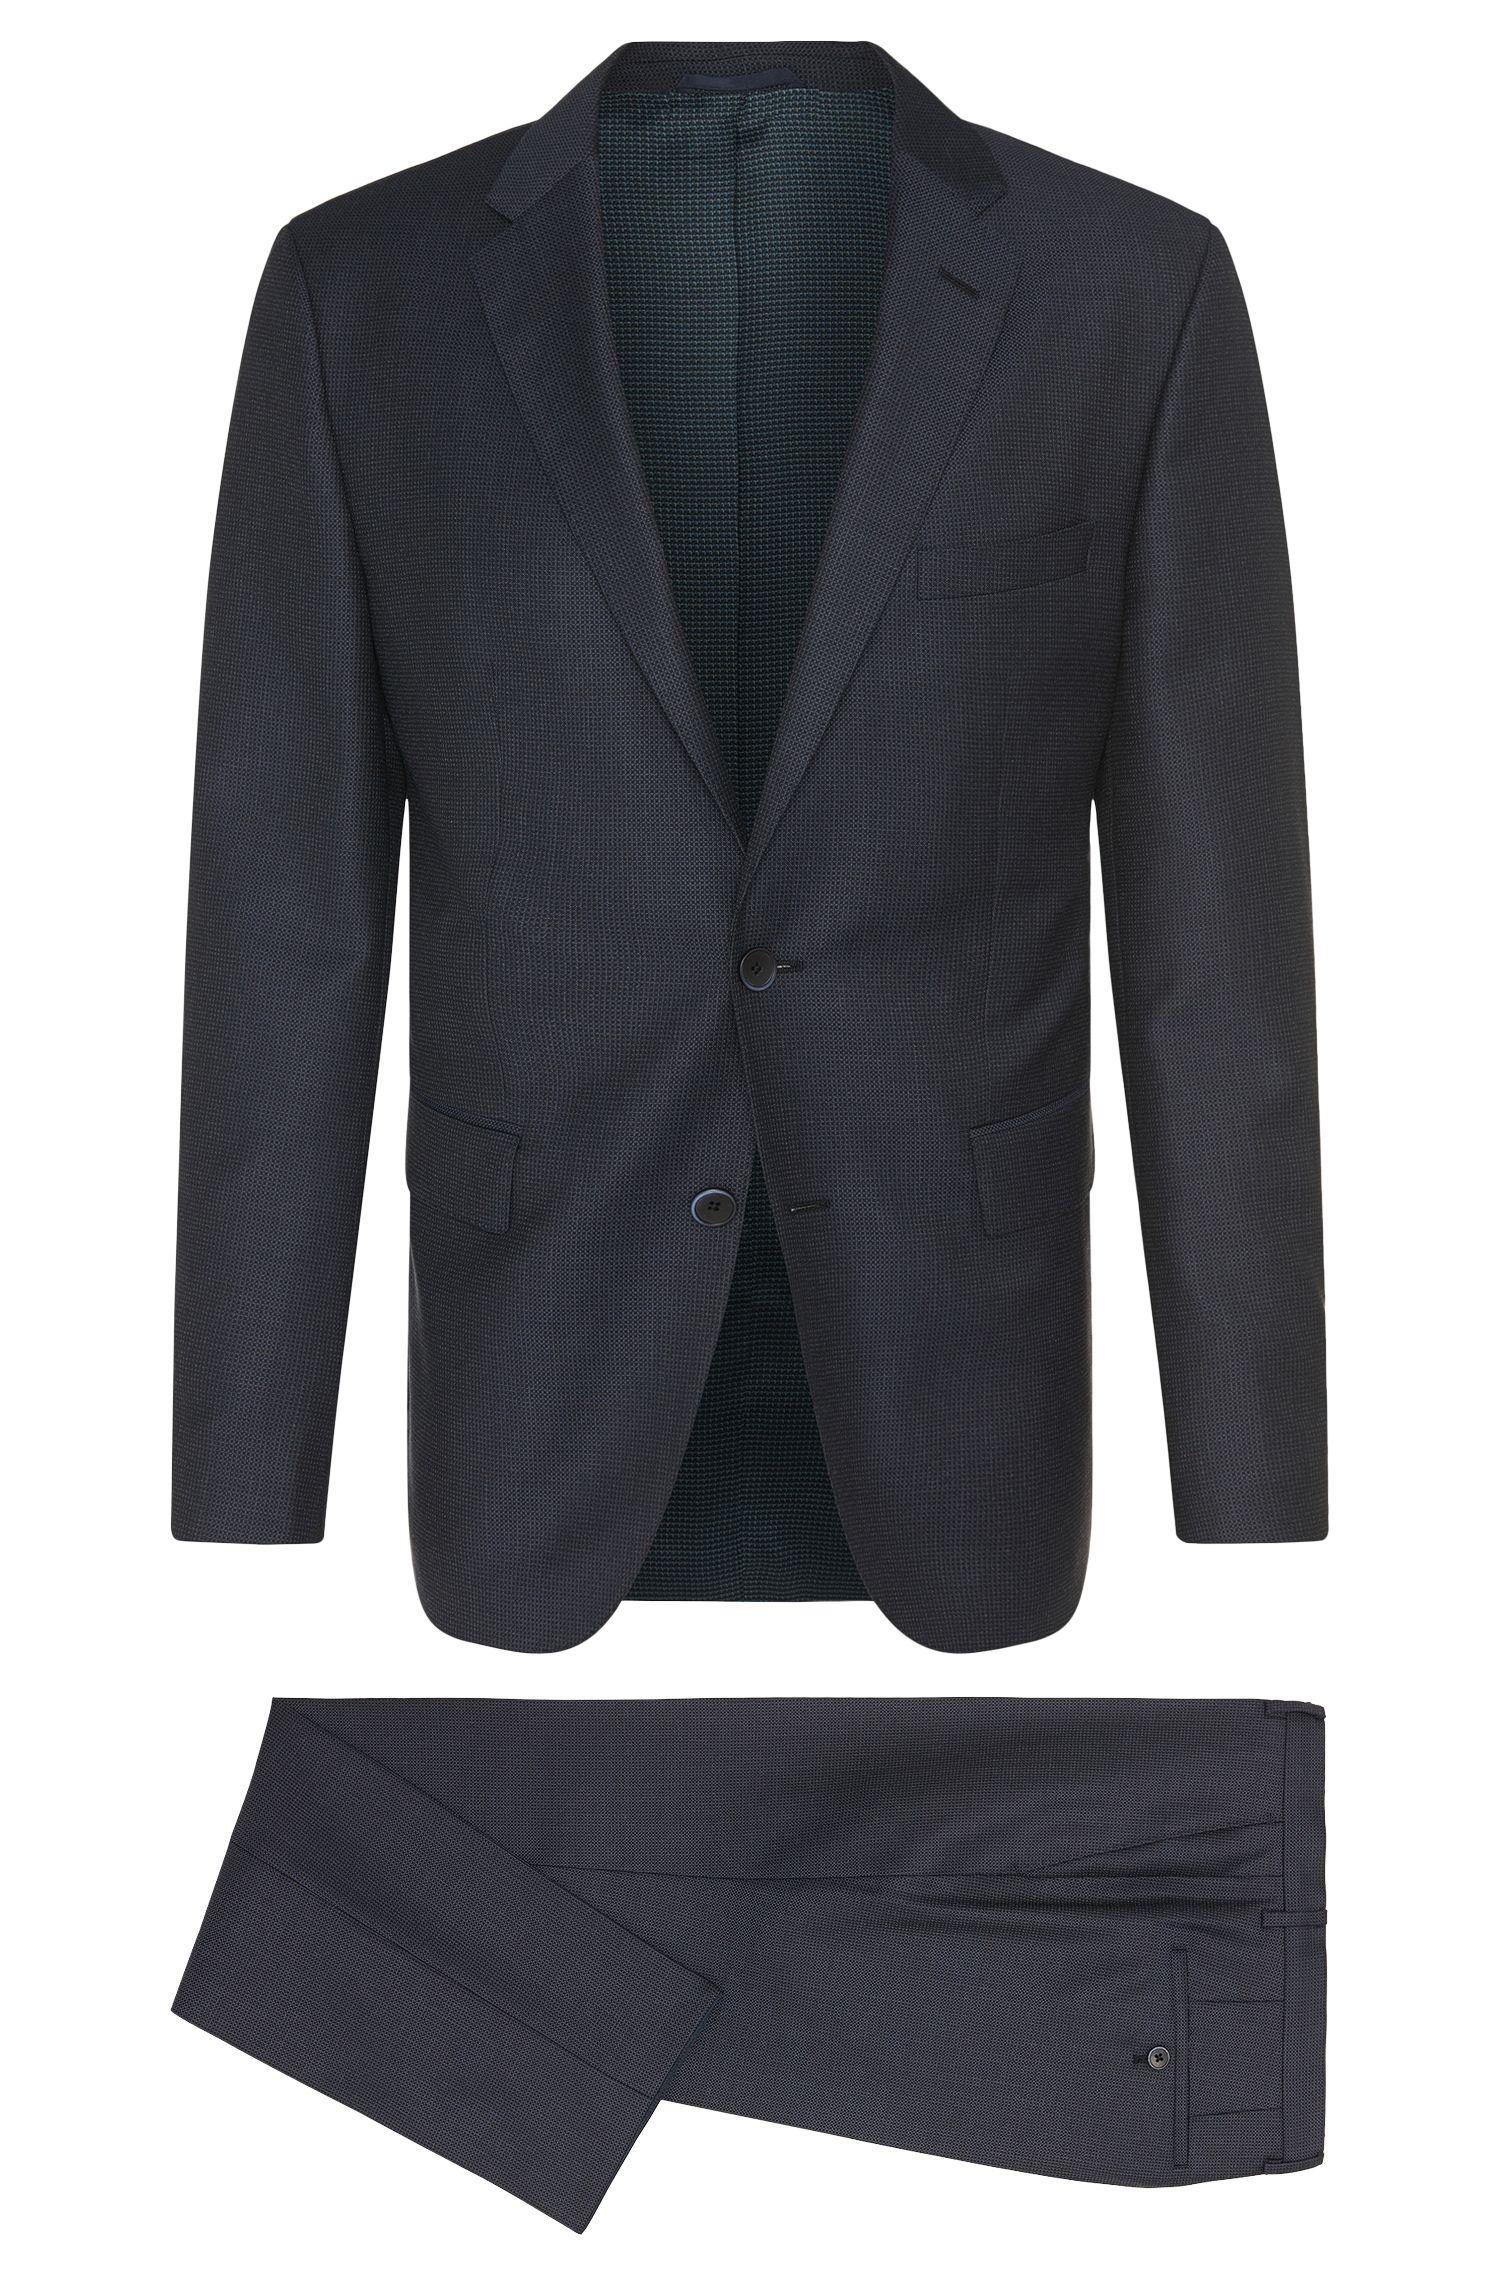 'Jewels/Linus' | Regular Fit, Super 120 Italian Wool Suit